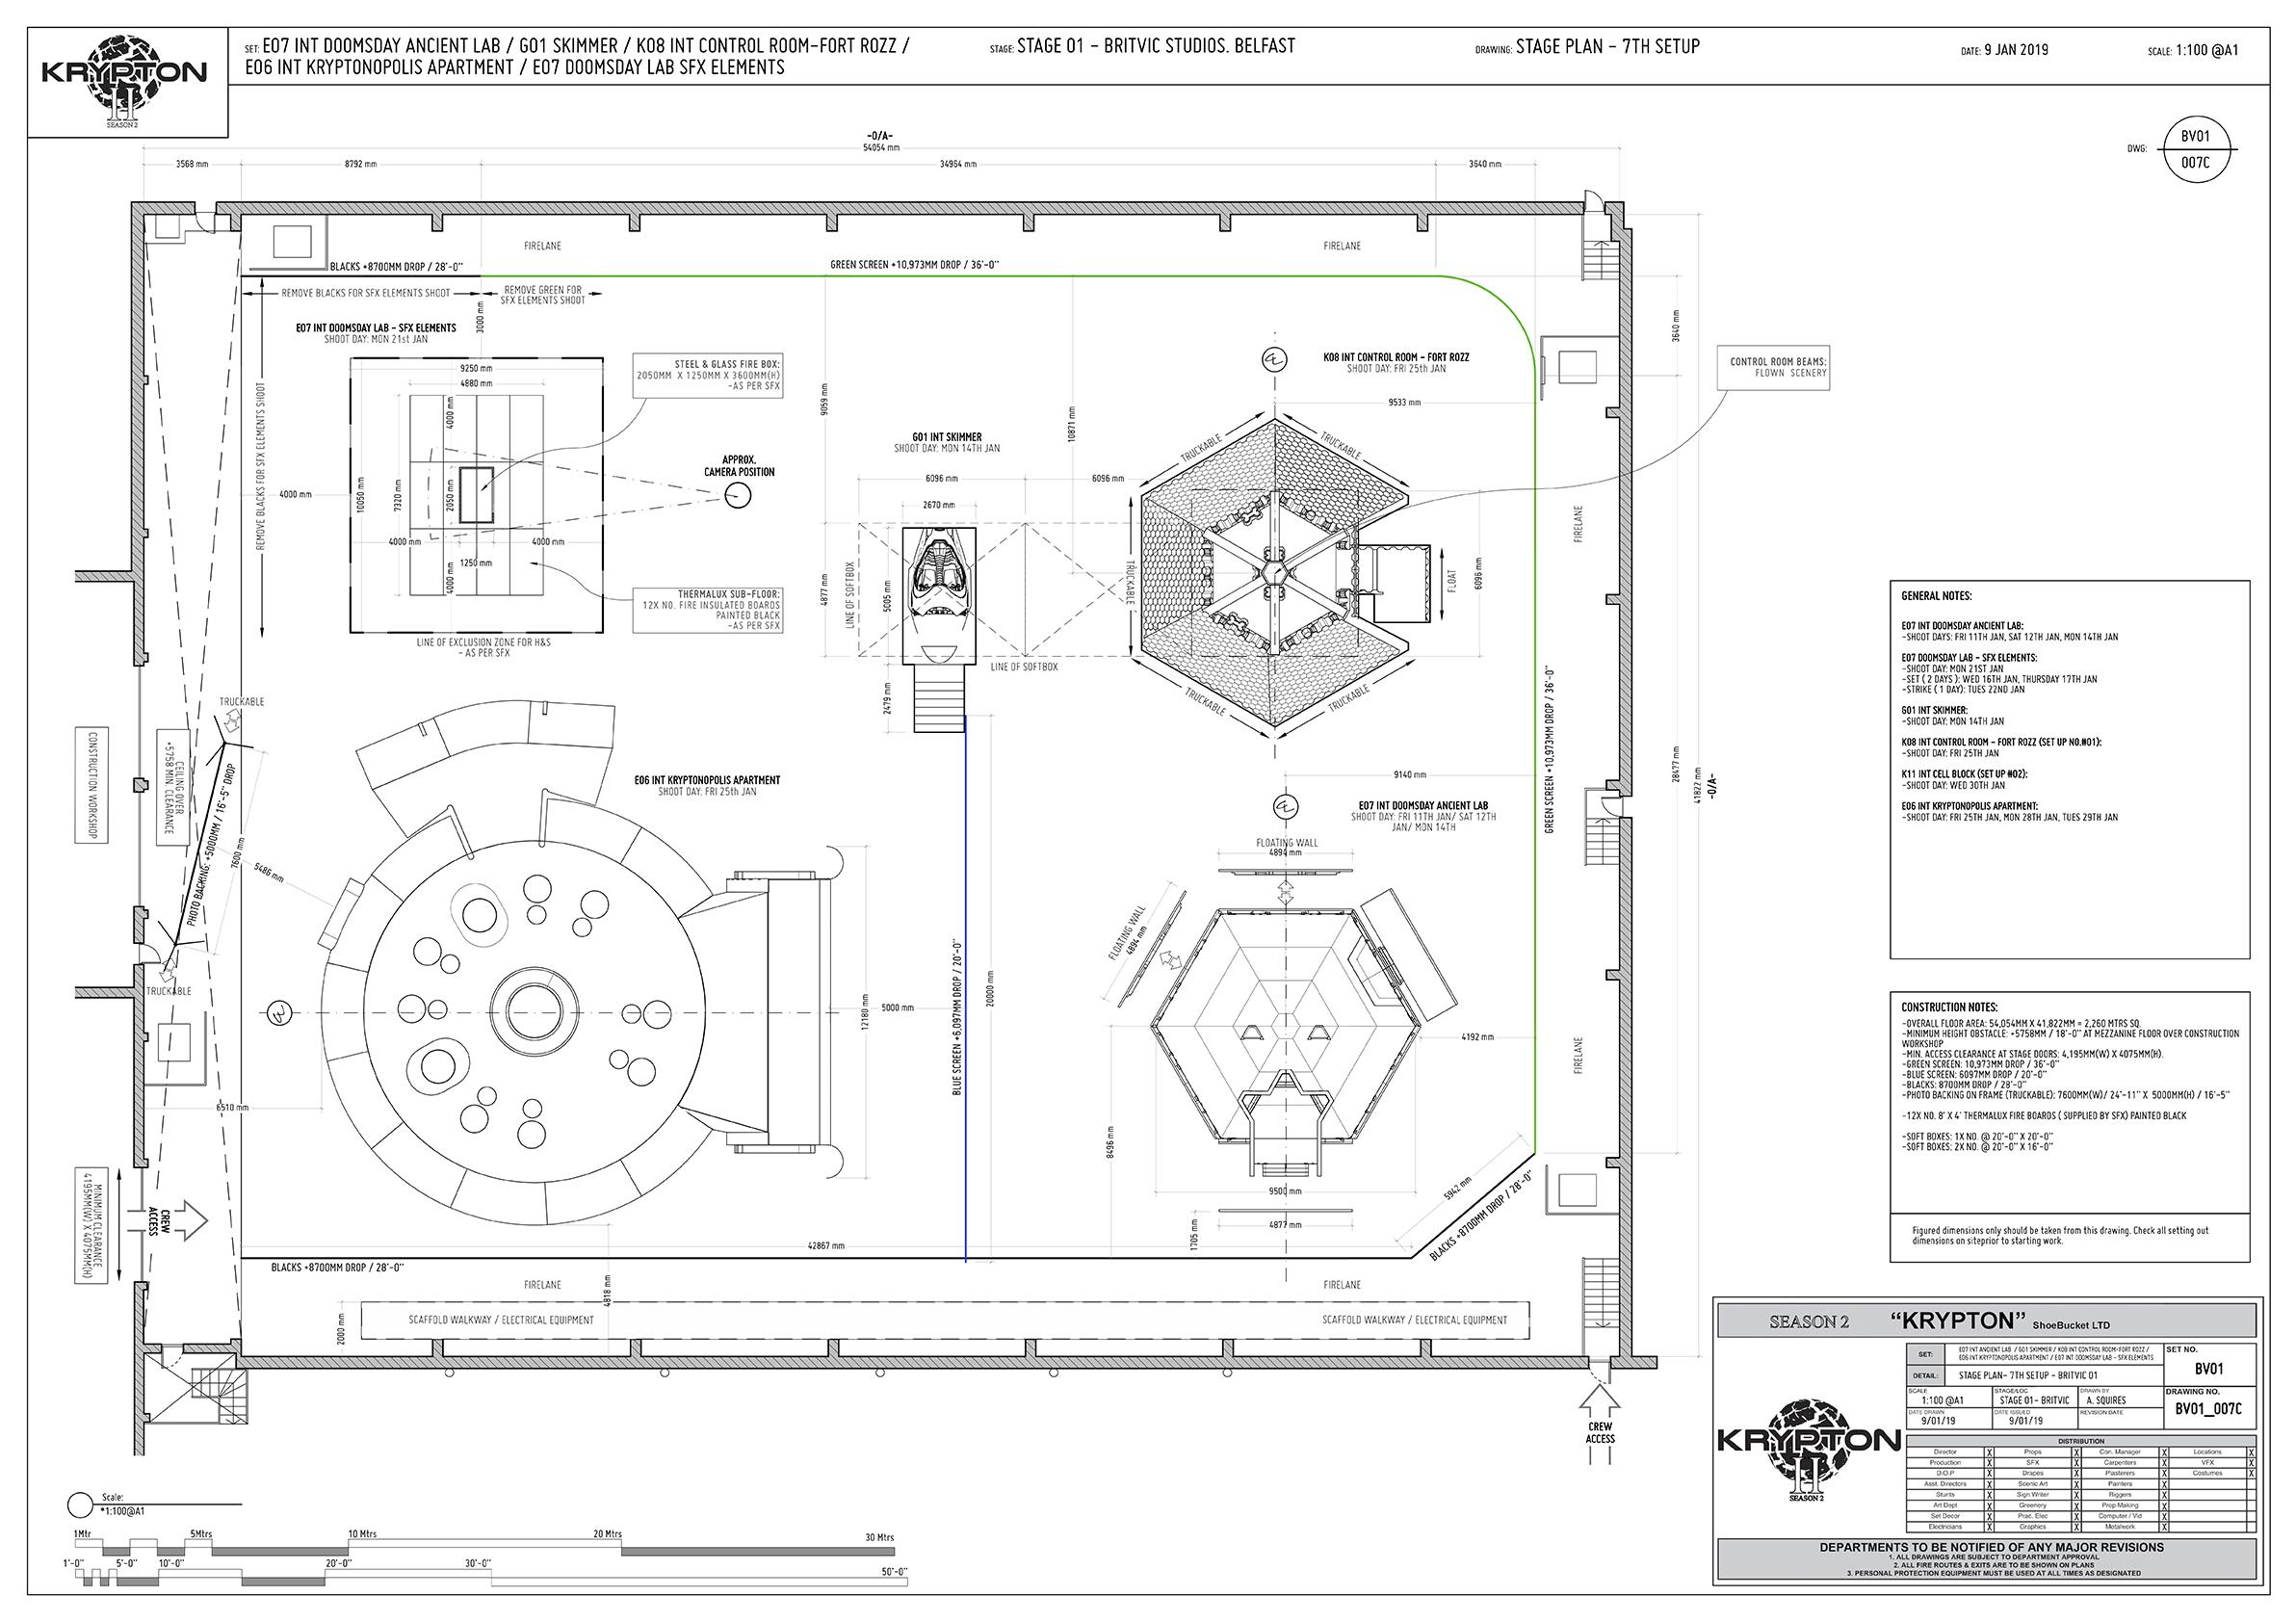 ADAM SQUIRES_KRYPTON S2_STAGE PLAN_BRITVIC STUDIOS_01_2019.jpg